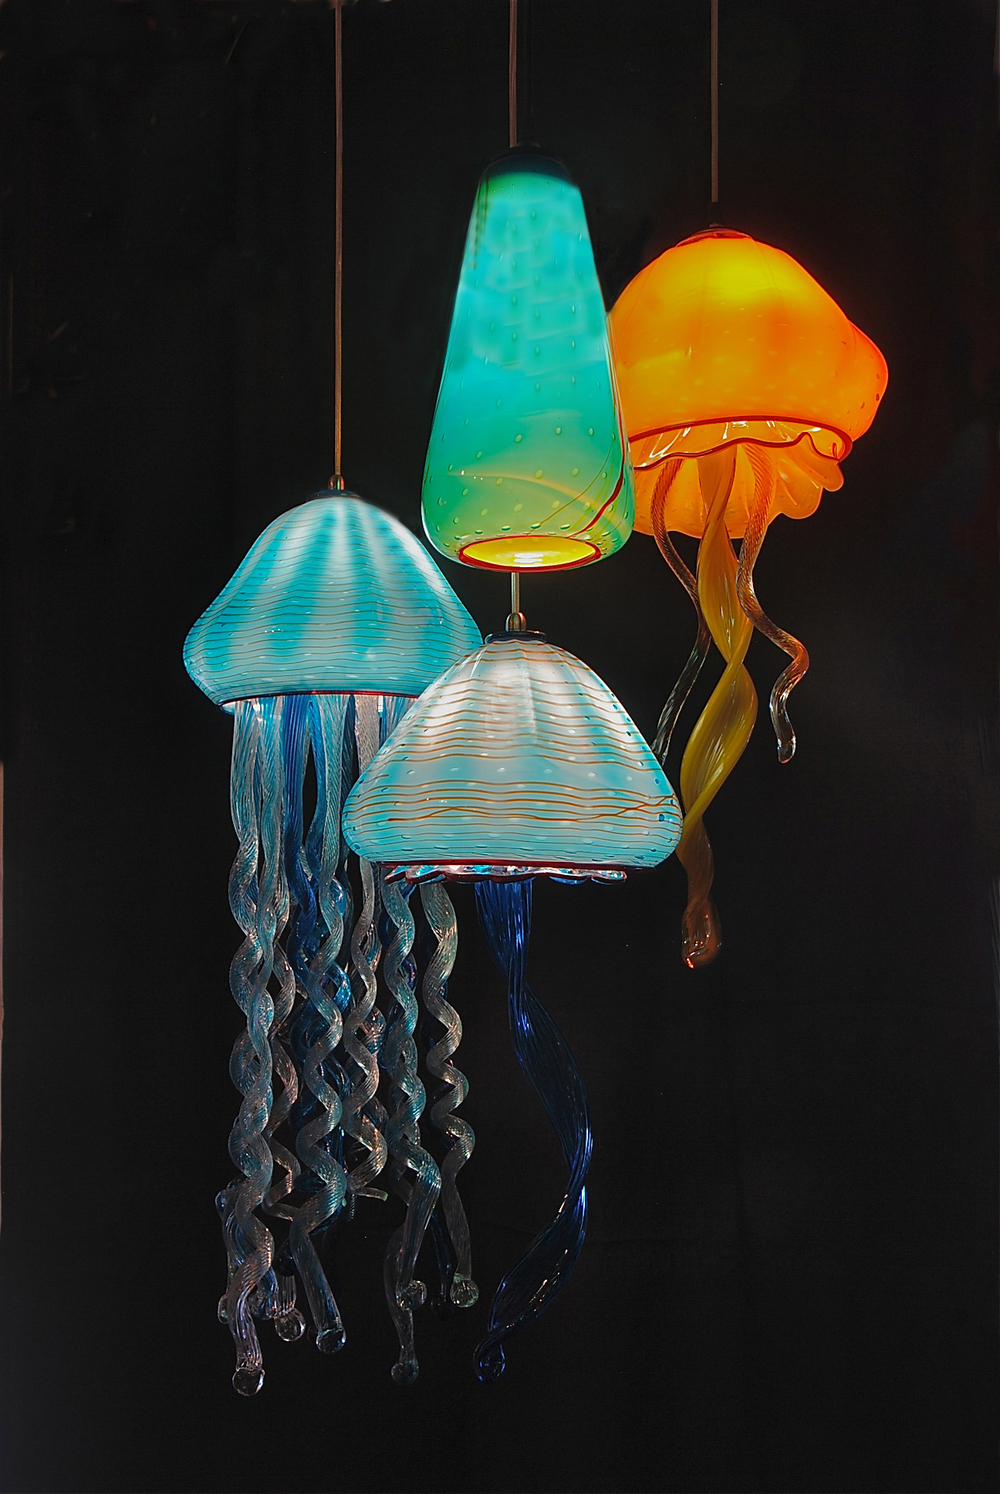 Striniartglasscustomlightingstriniartglasscustomlighting31st last day of may jelly fish pendant - Lamp may day ...